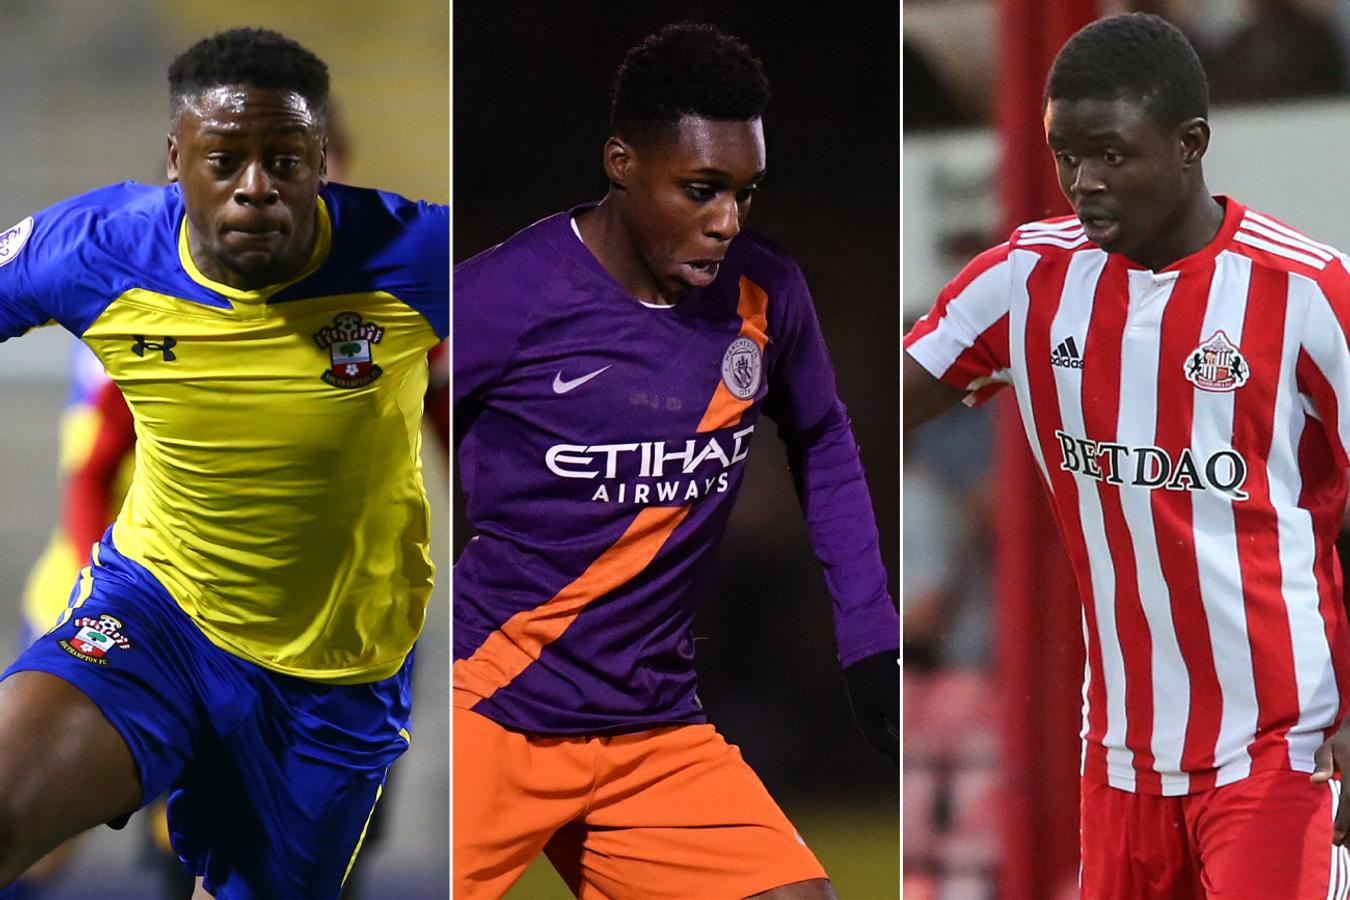 February PL2 POTM: Jonathan Afolabi (Southampton), Jeremie Frimpong (Manchester City), Benjamin Mbunga-Kimpioka (Sunderland)